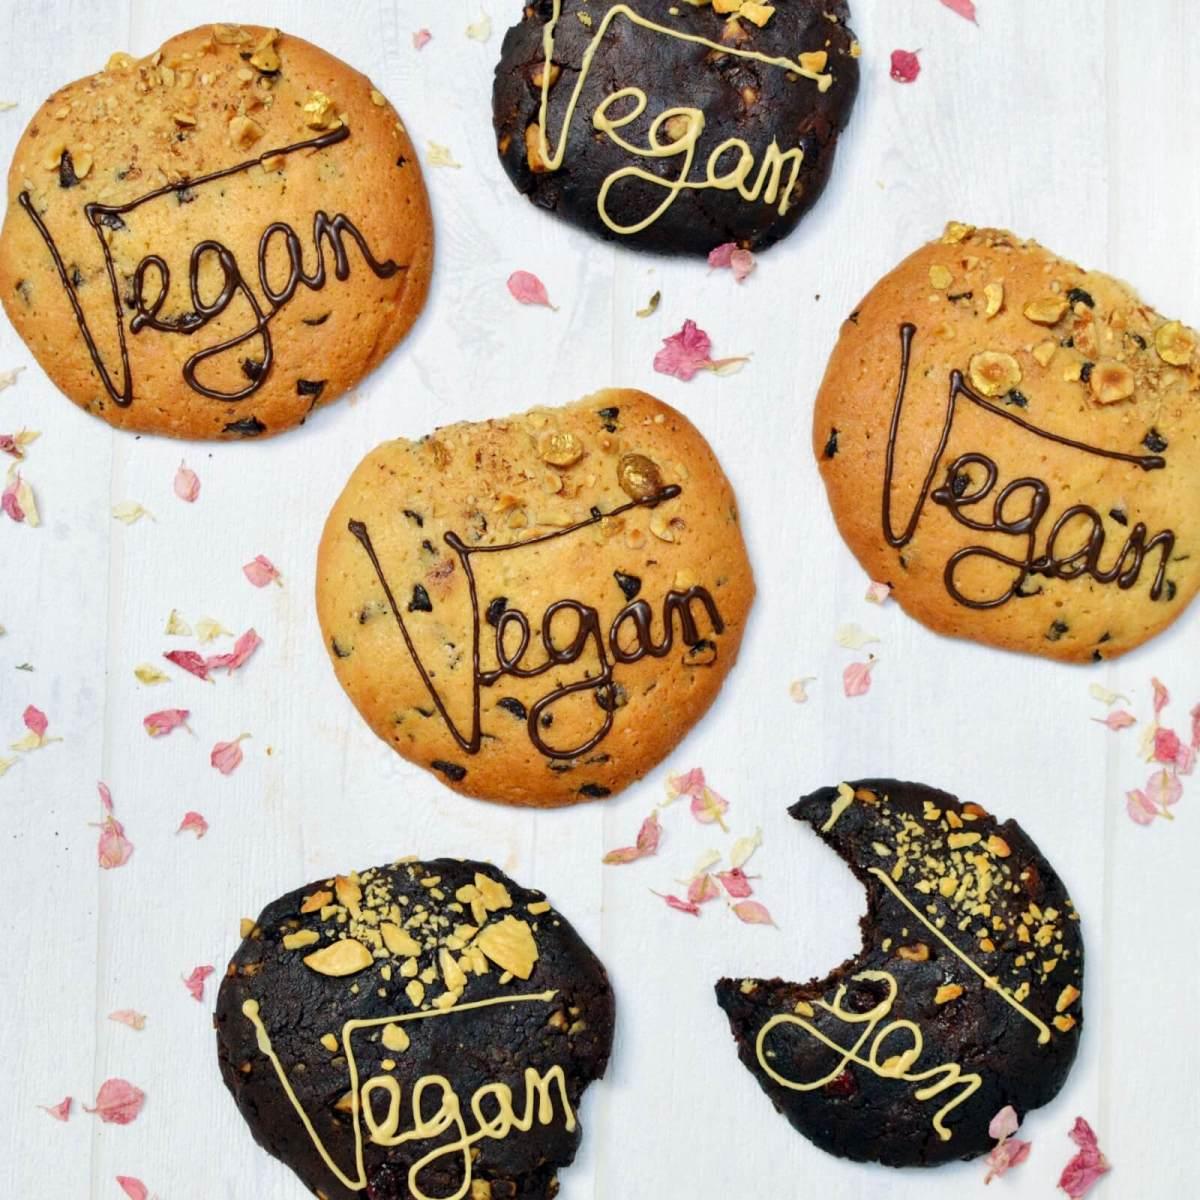 cookie vegan jo and nana cakes